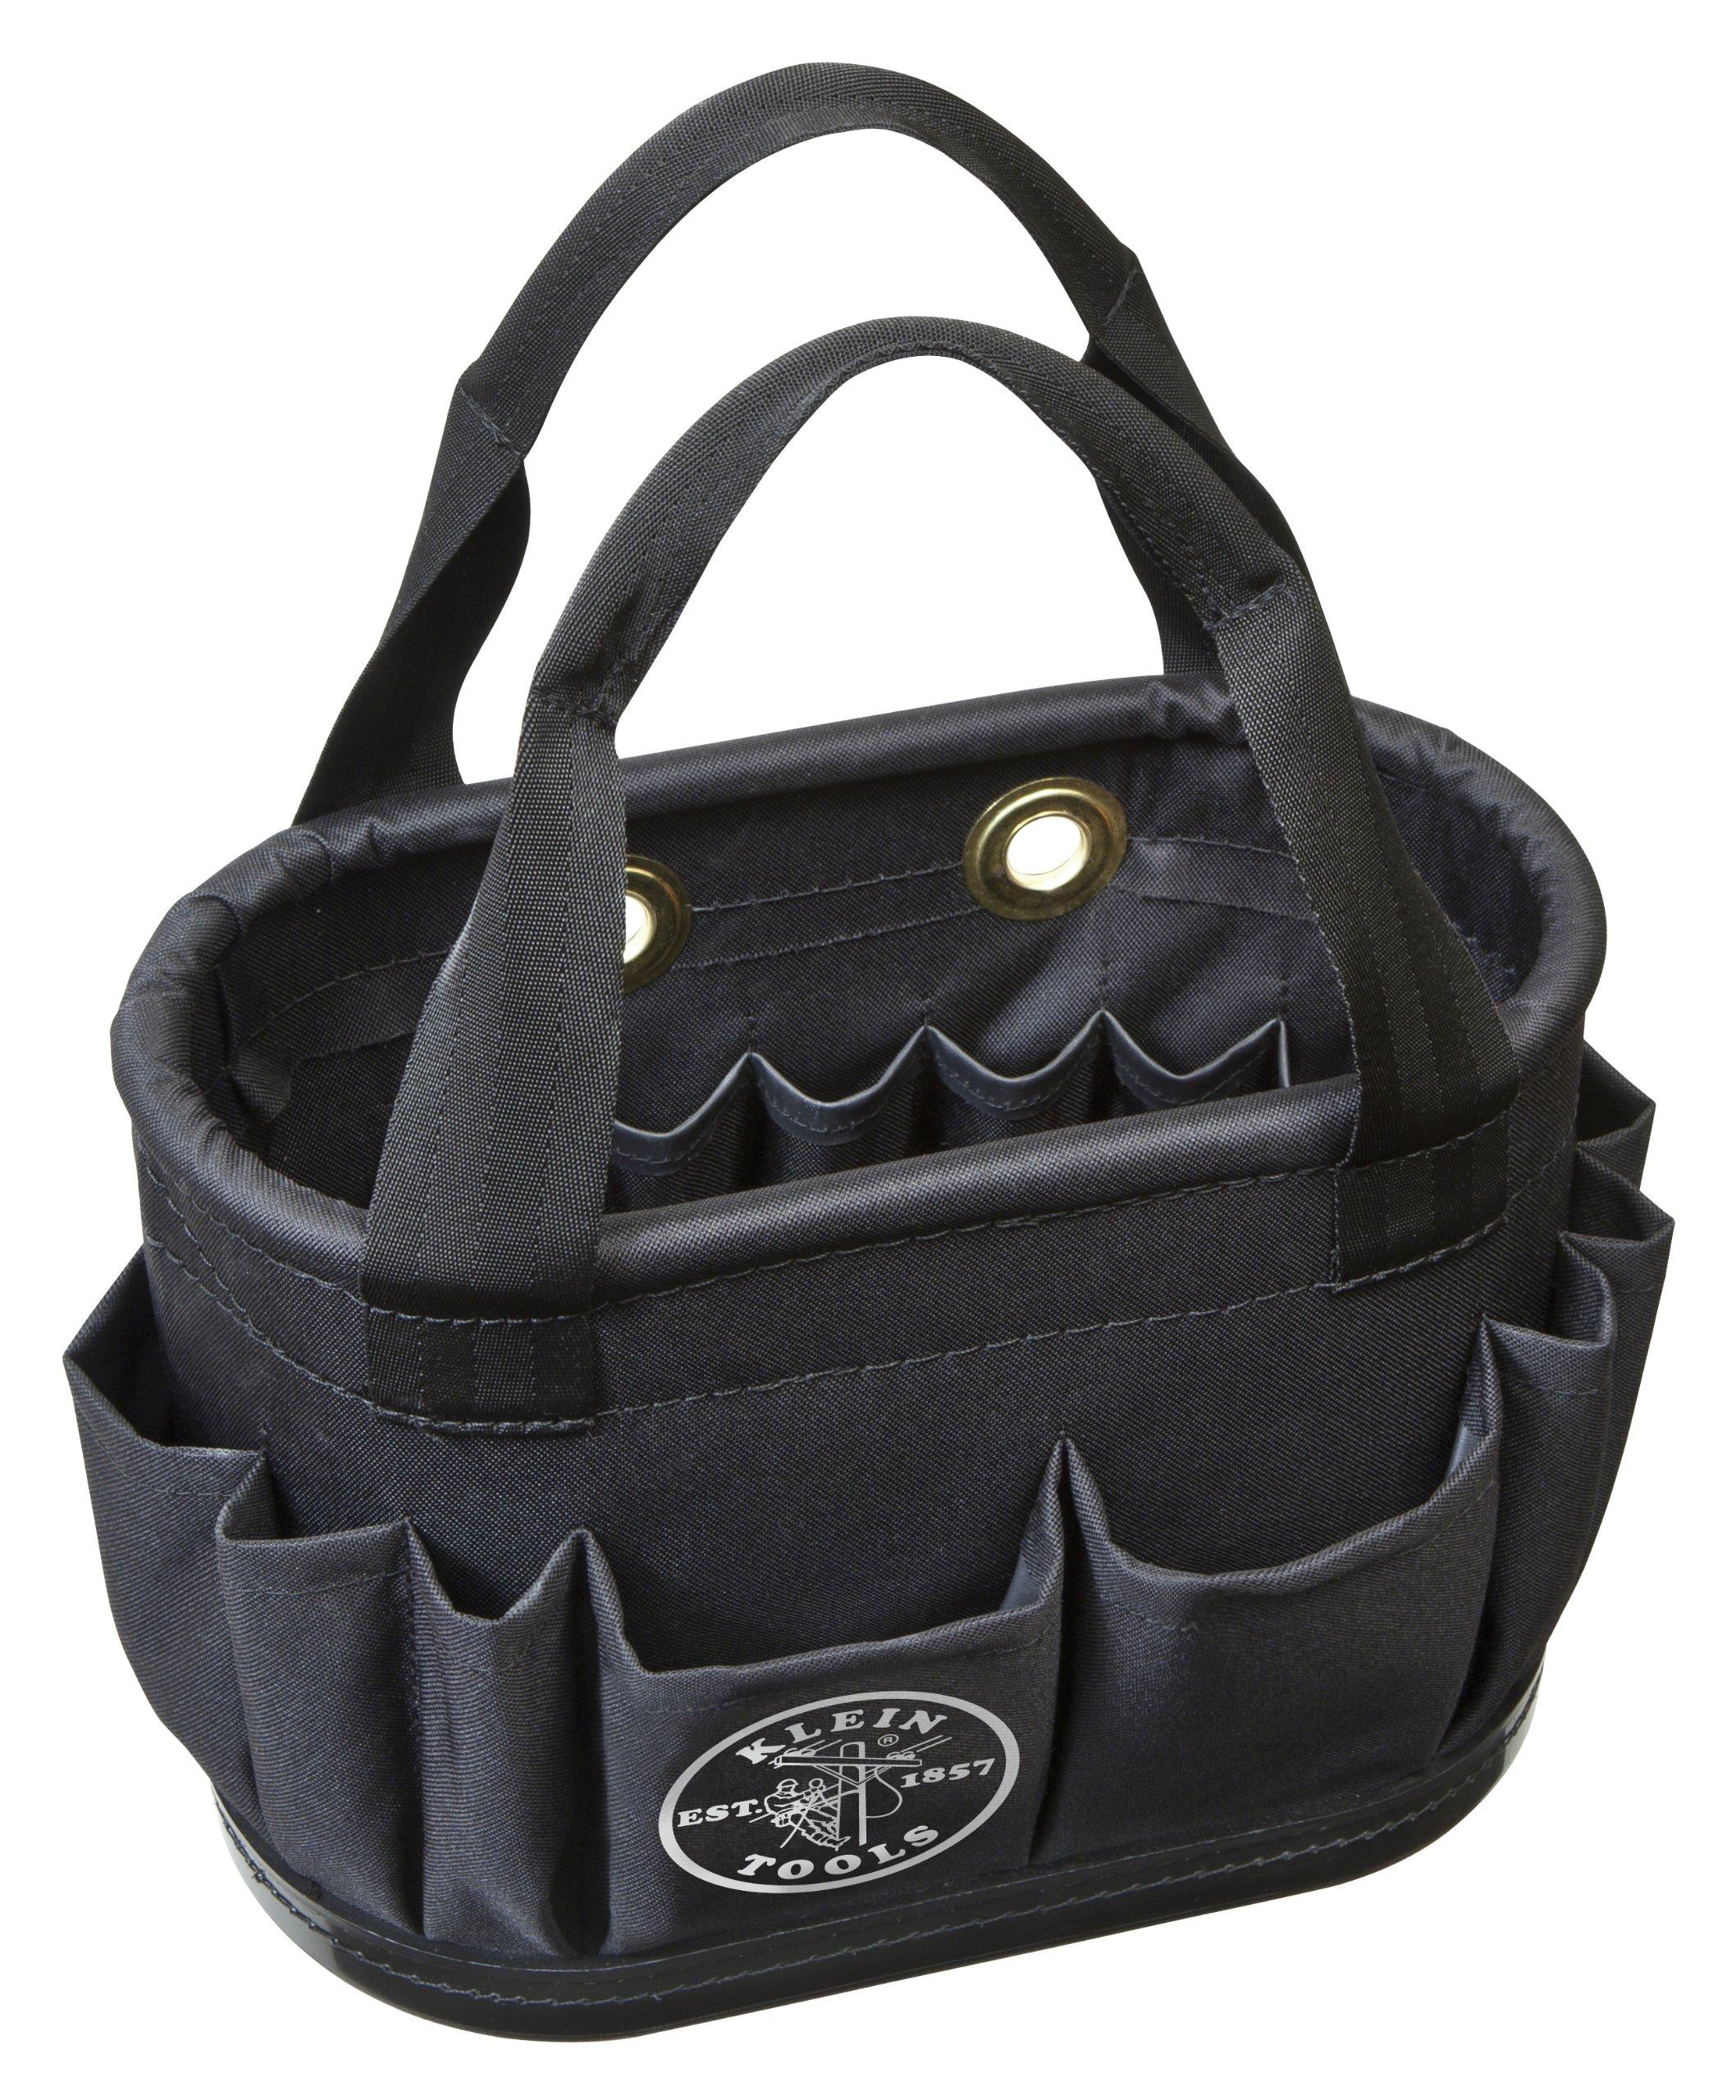 Aerial Bucket, Hard-Body Lineman Bucket, 29 Pockets, Heavy Duty Oval Bucket Bag Klein Tools 5144BHB14OS by Klein Tools